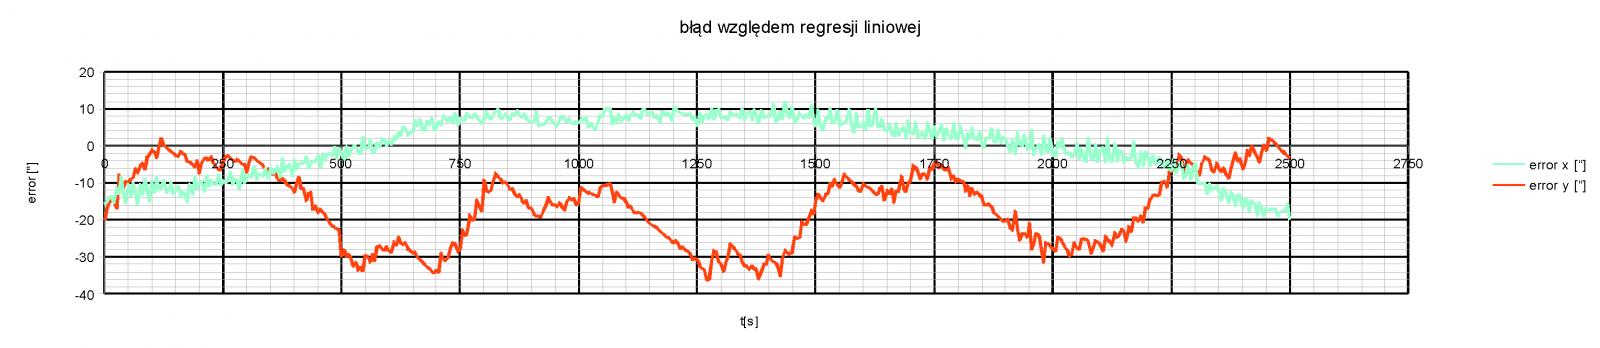 wykres_blad_wzgledny_8kwietnia_enkoder.png